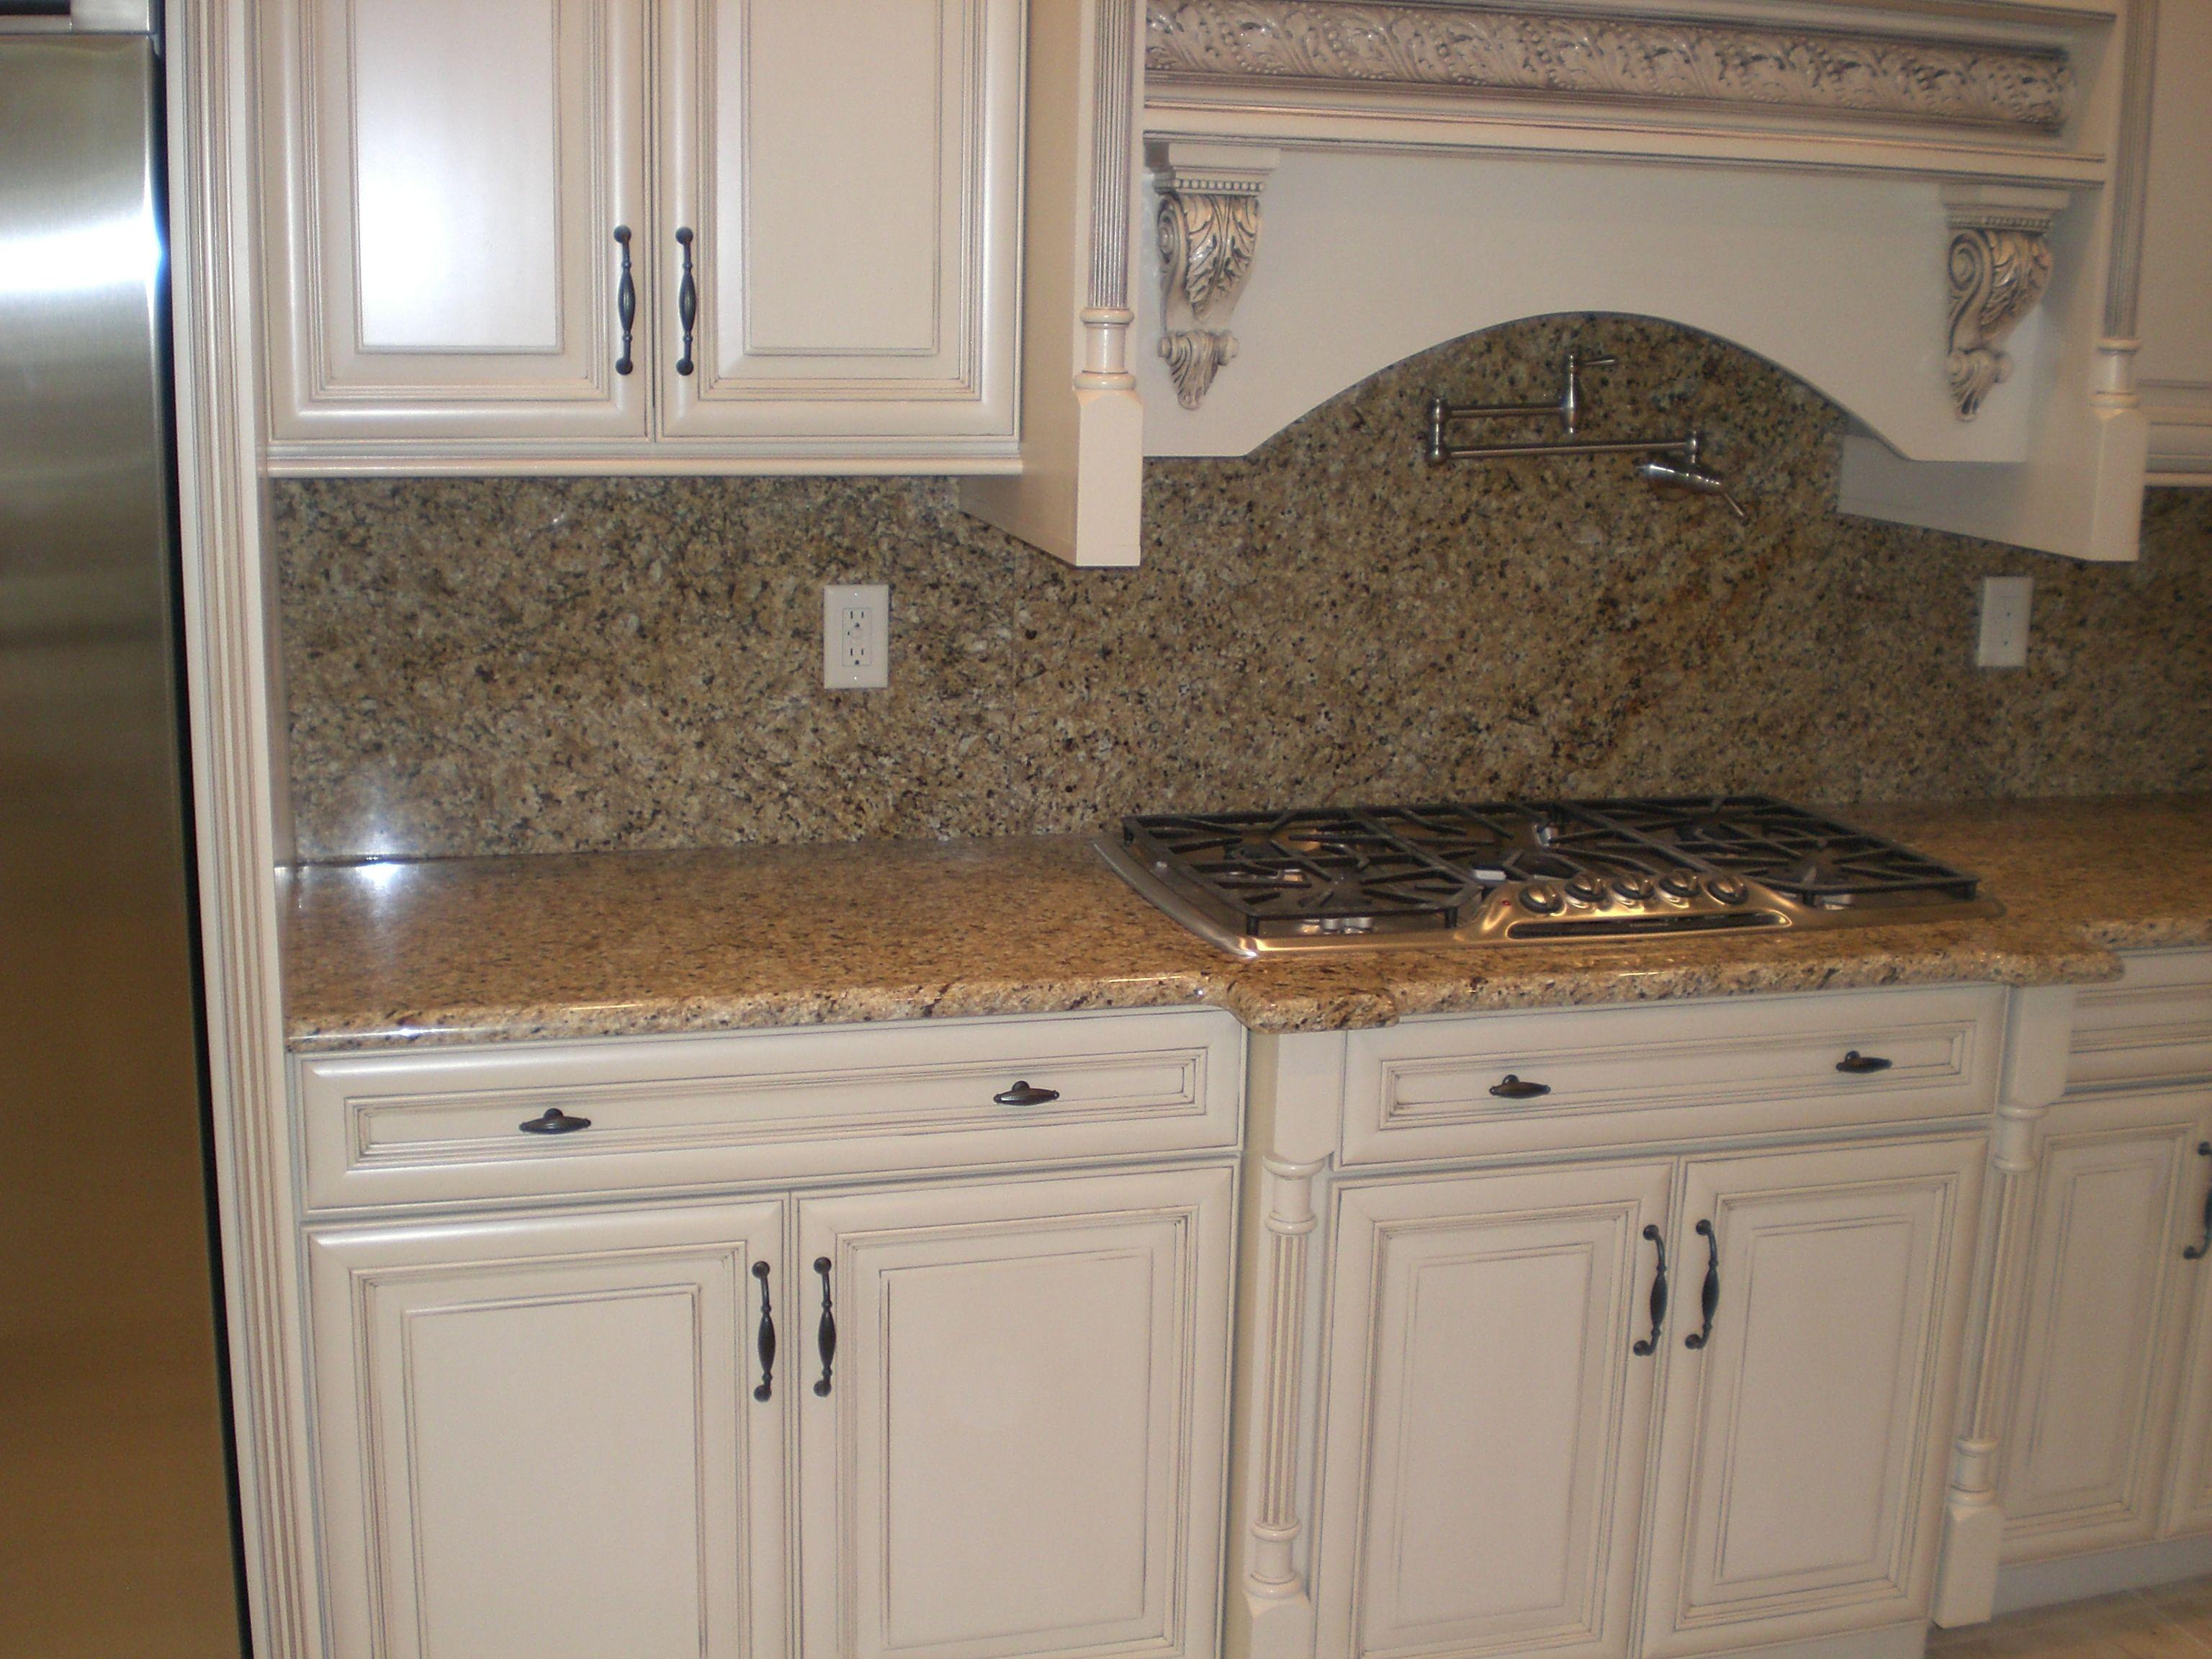 New Venetian Gold granite for bathroom countertops | Ideas for the ...